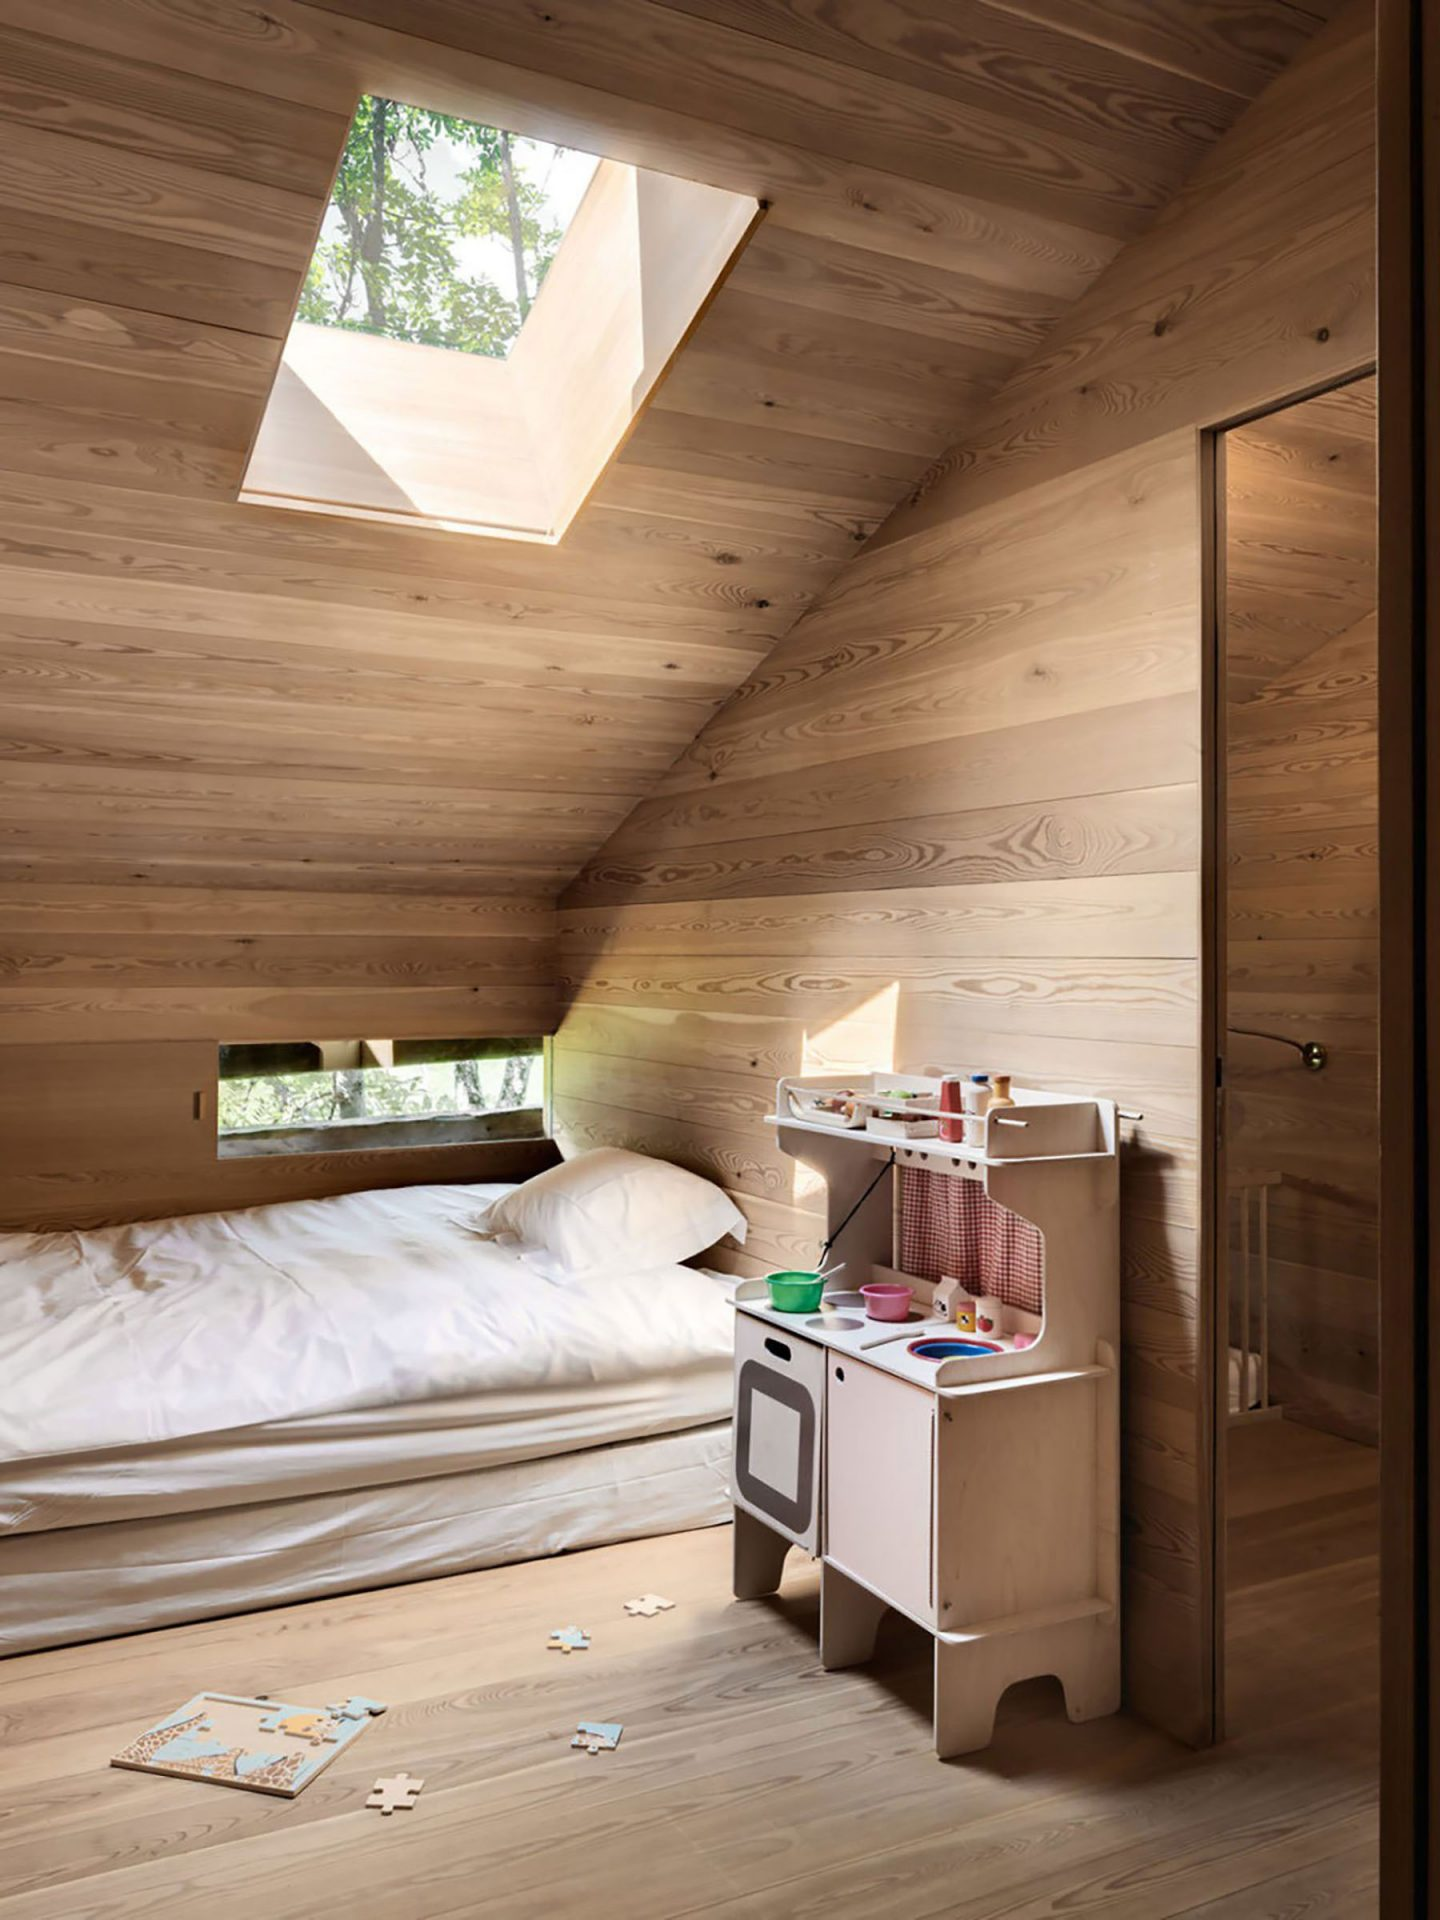 iGNANT-Architecture-Rapin-Saiz-Sarreyer-Cabin-14